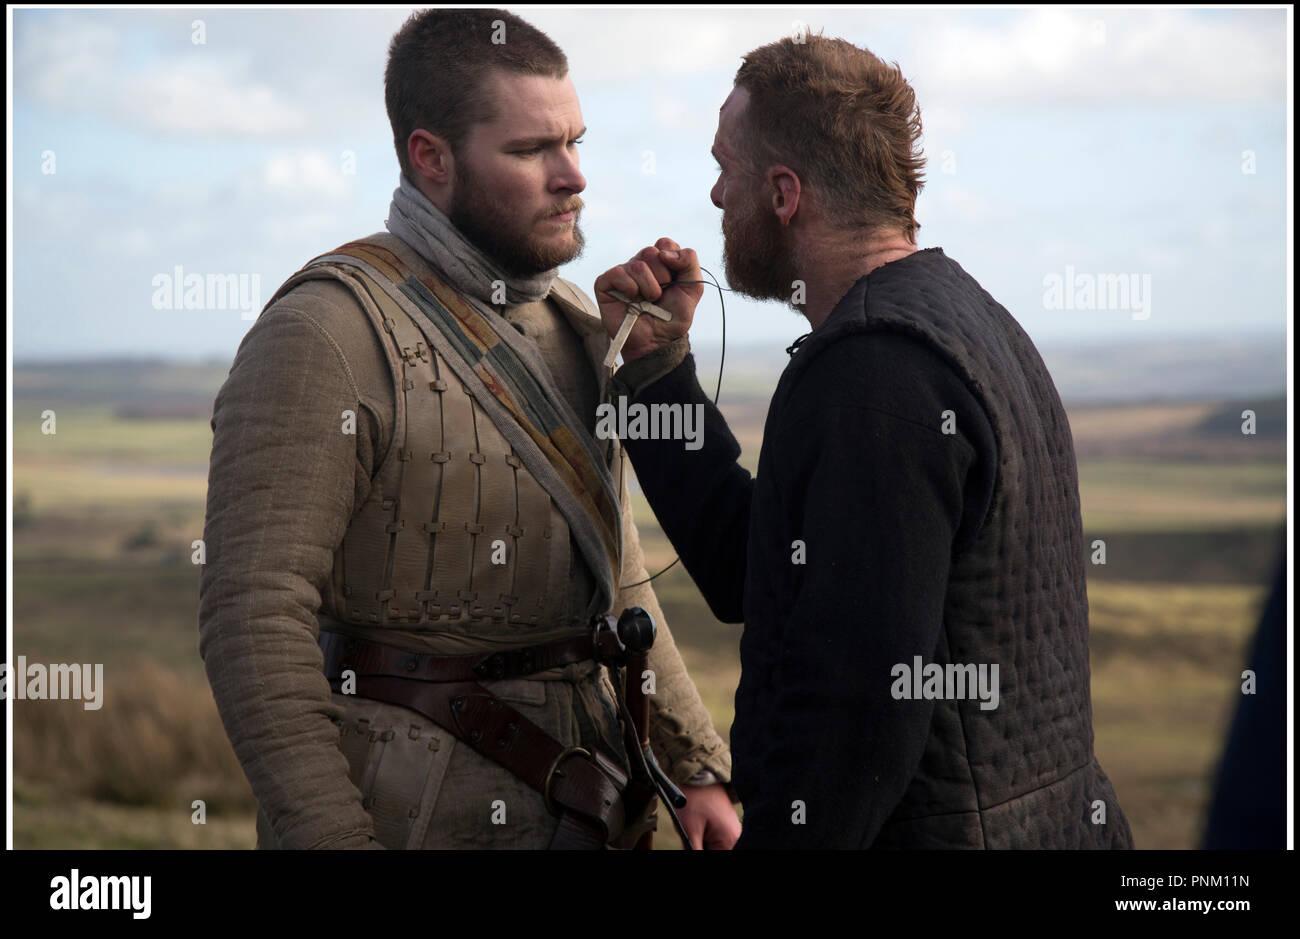 Download Film Macbeth 2015